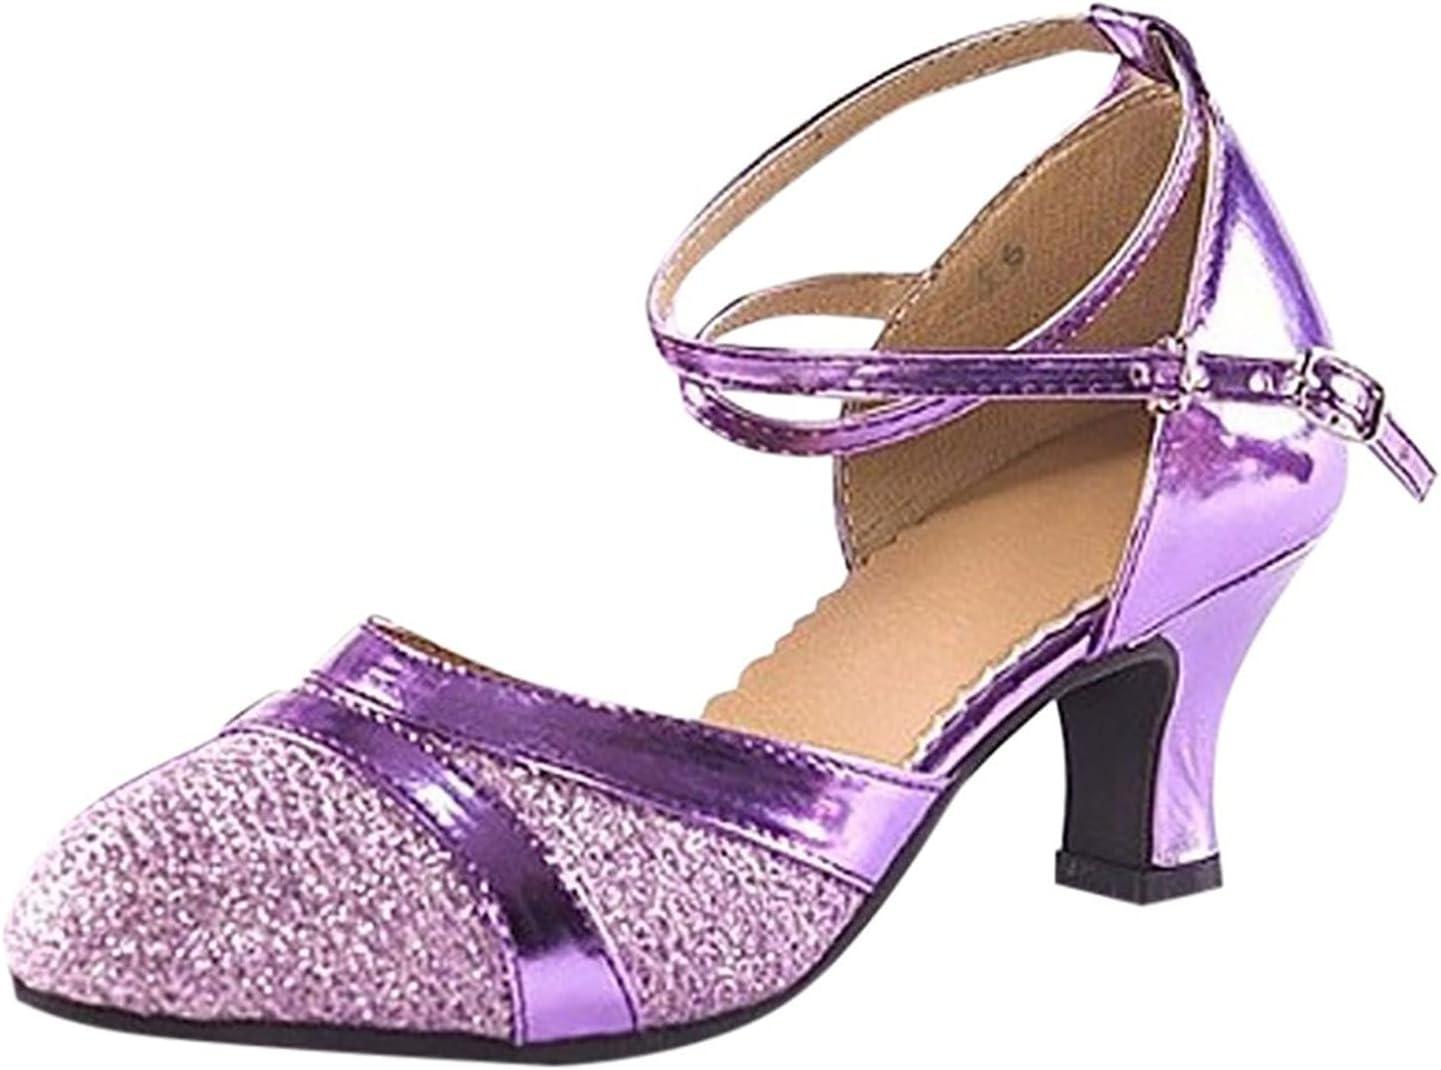 Soft Sole Square Dance Shoes, Ladies Adult Latin Baotou High Sch